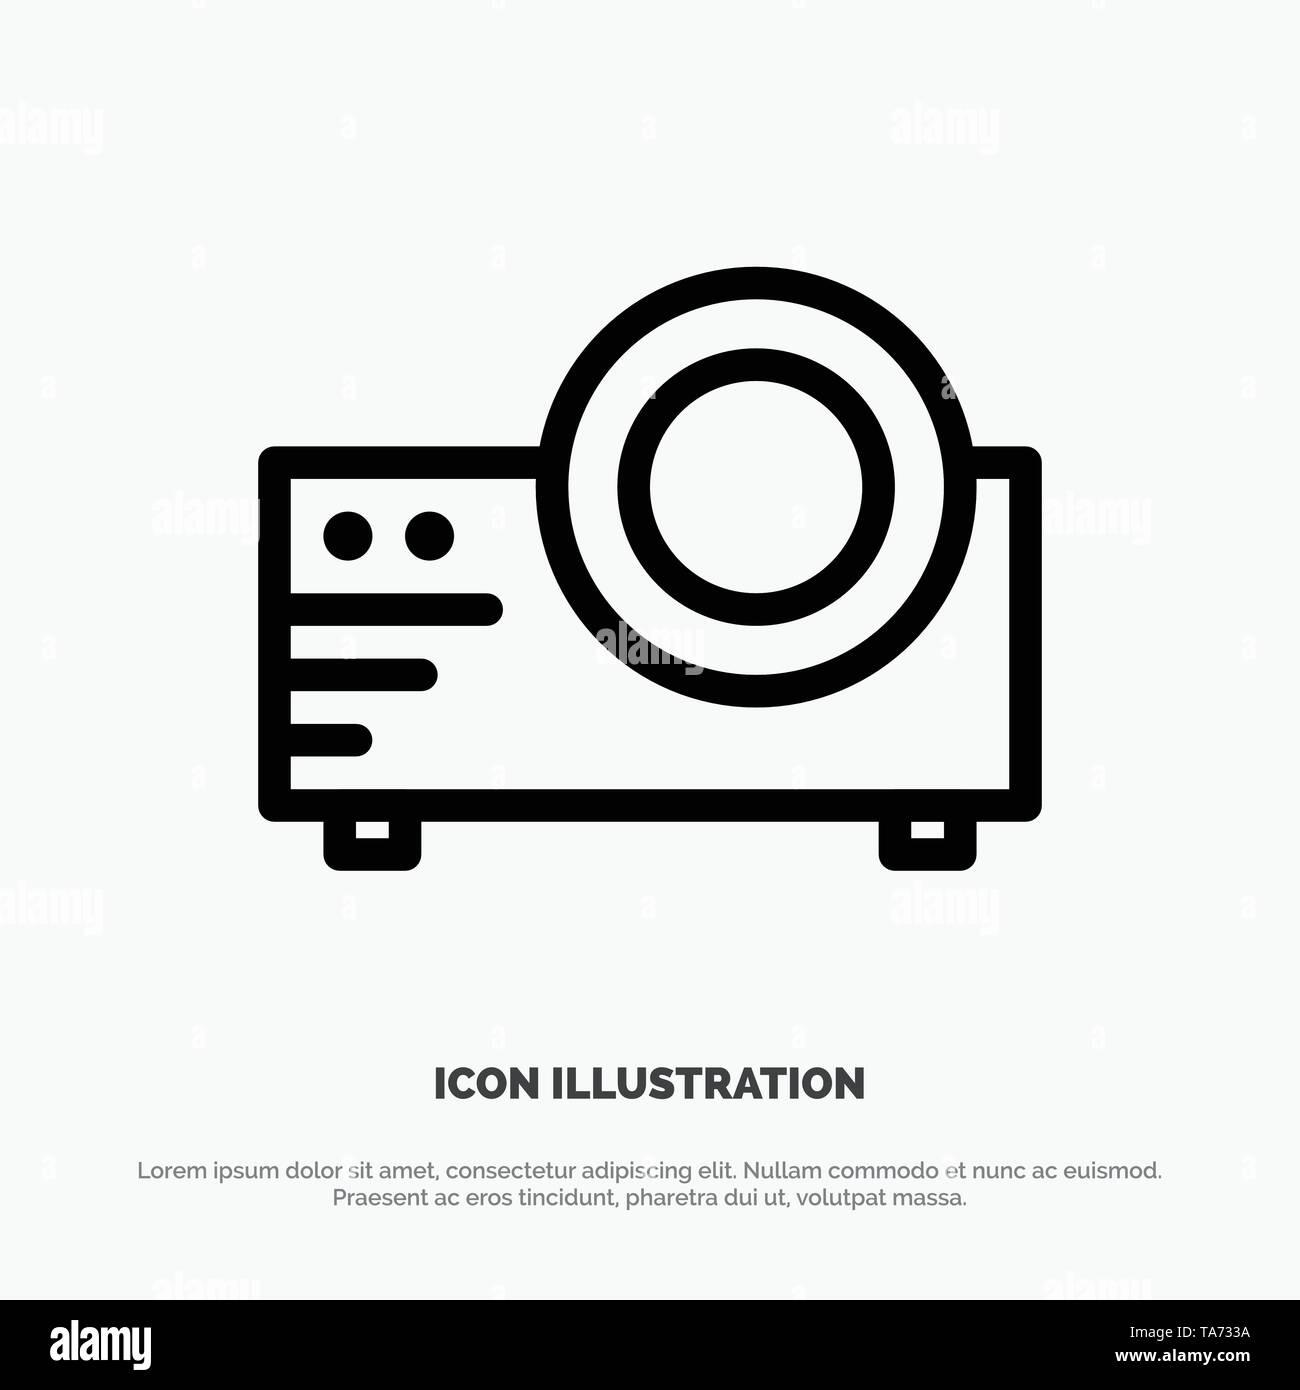 Projector, Film, Movie, Multi Media Line Icon Vector - Stock Image